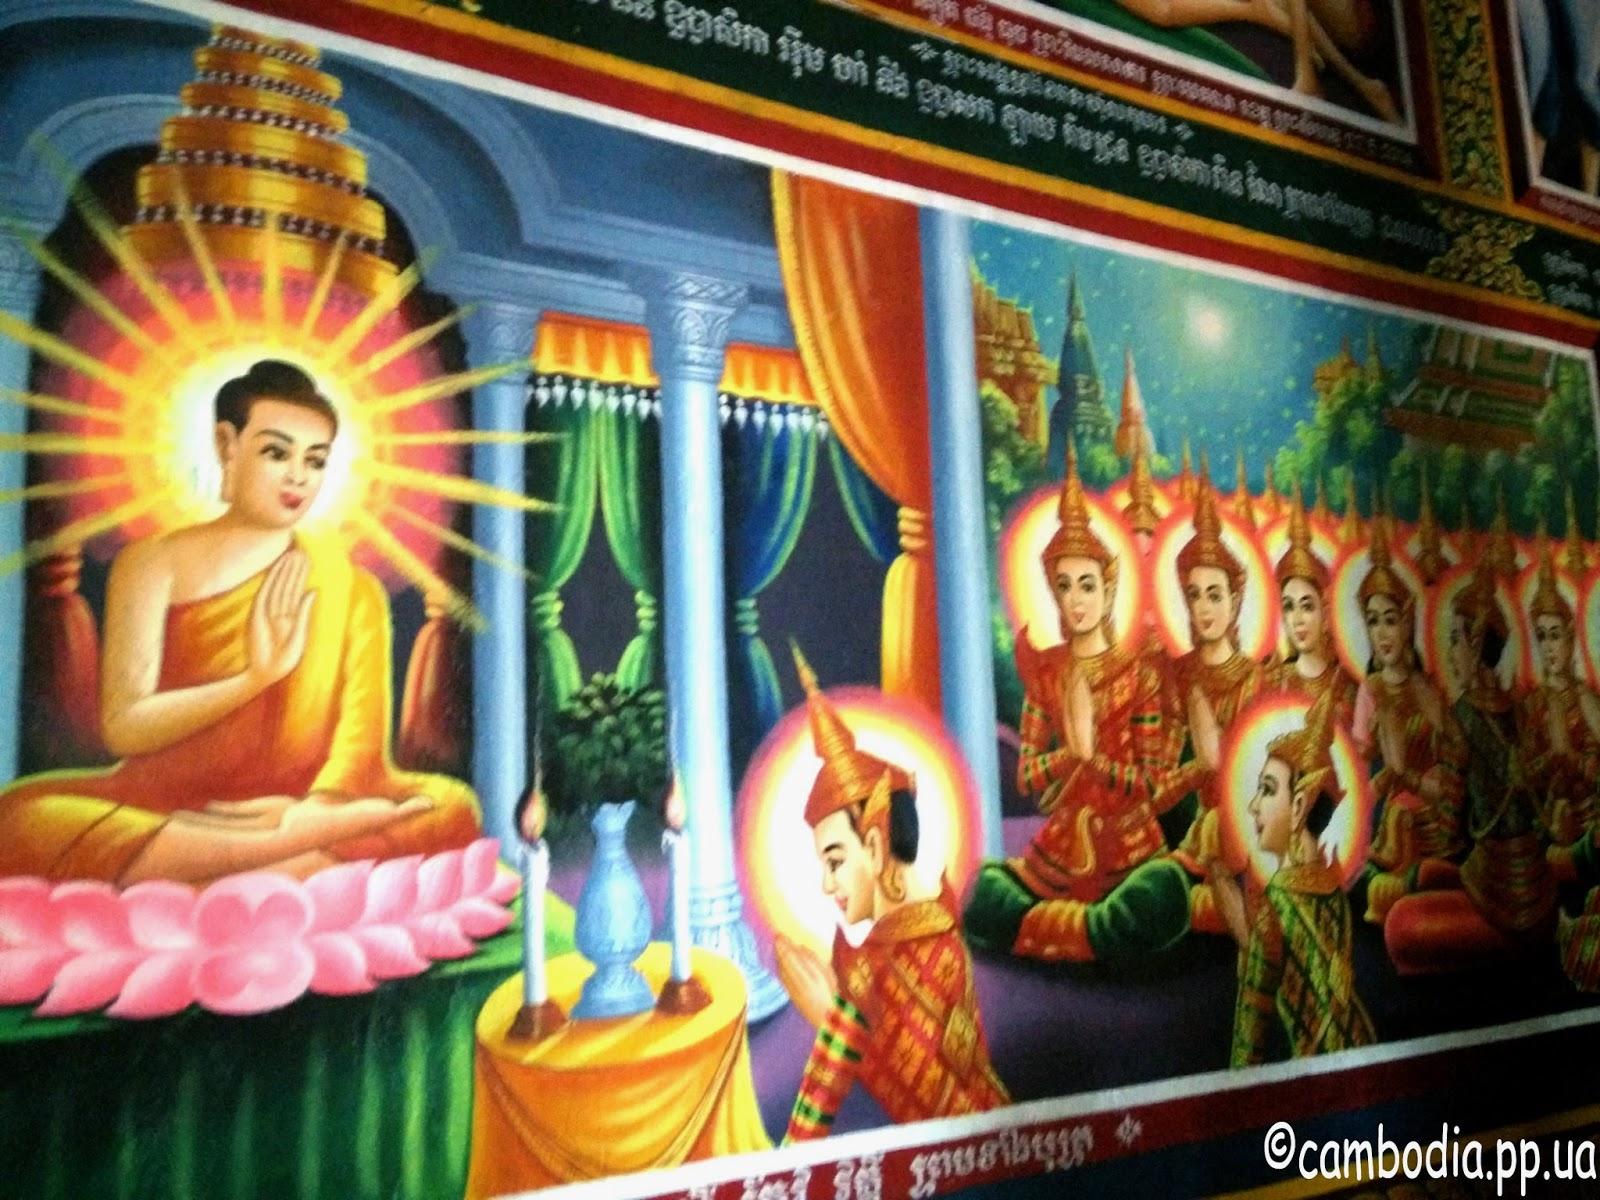 Картина на стене буддиского храма